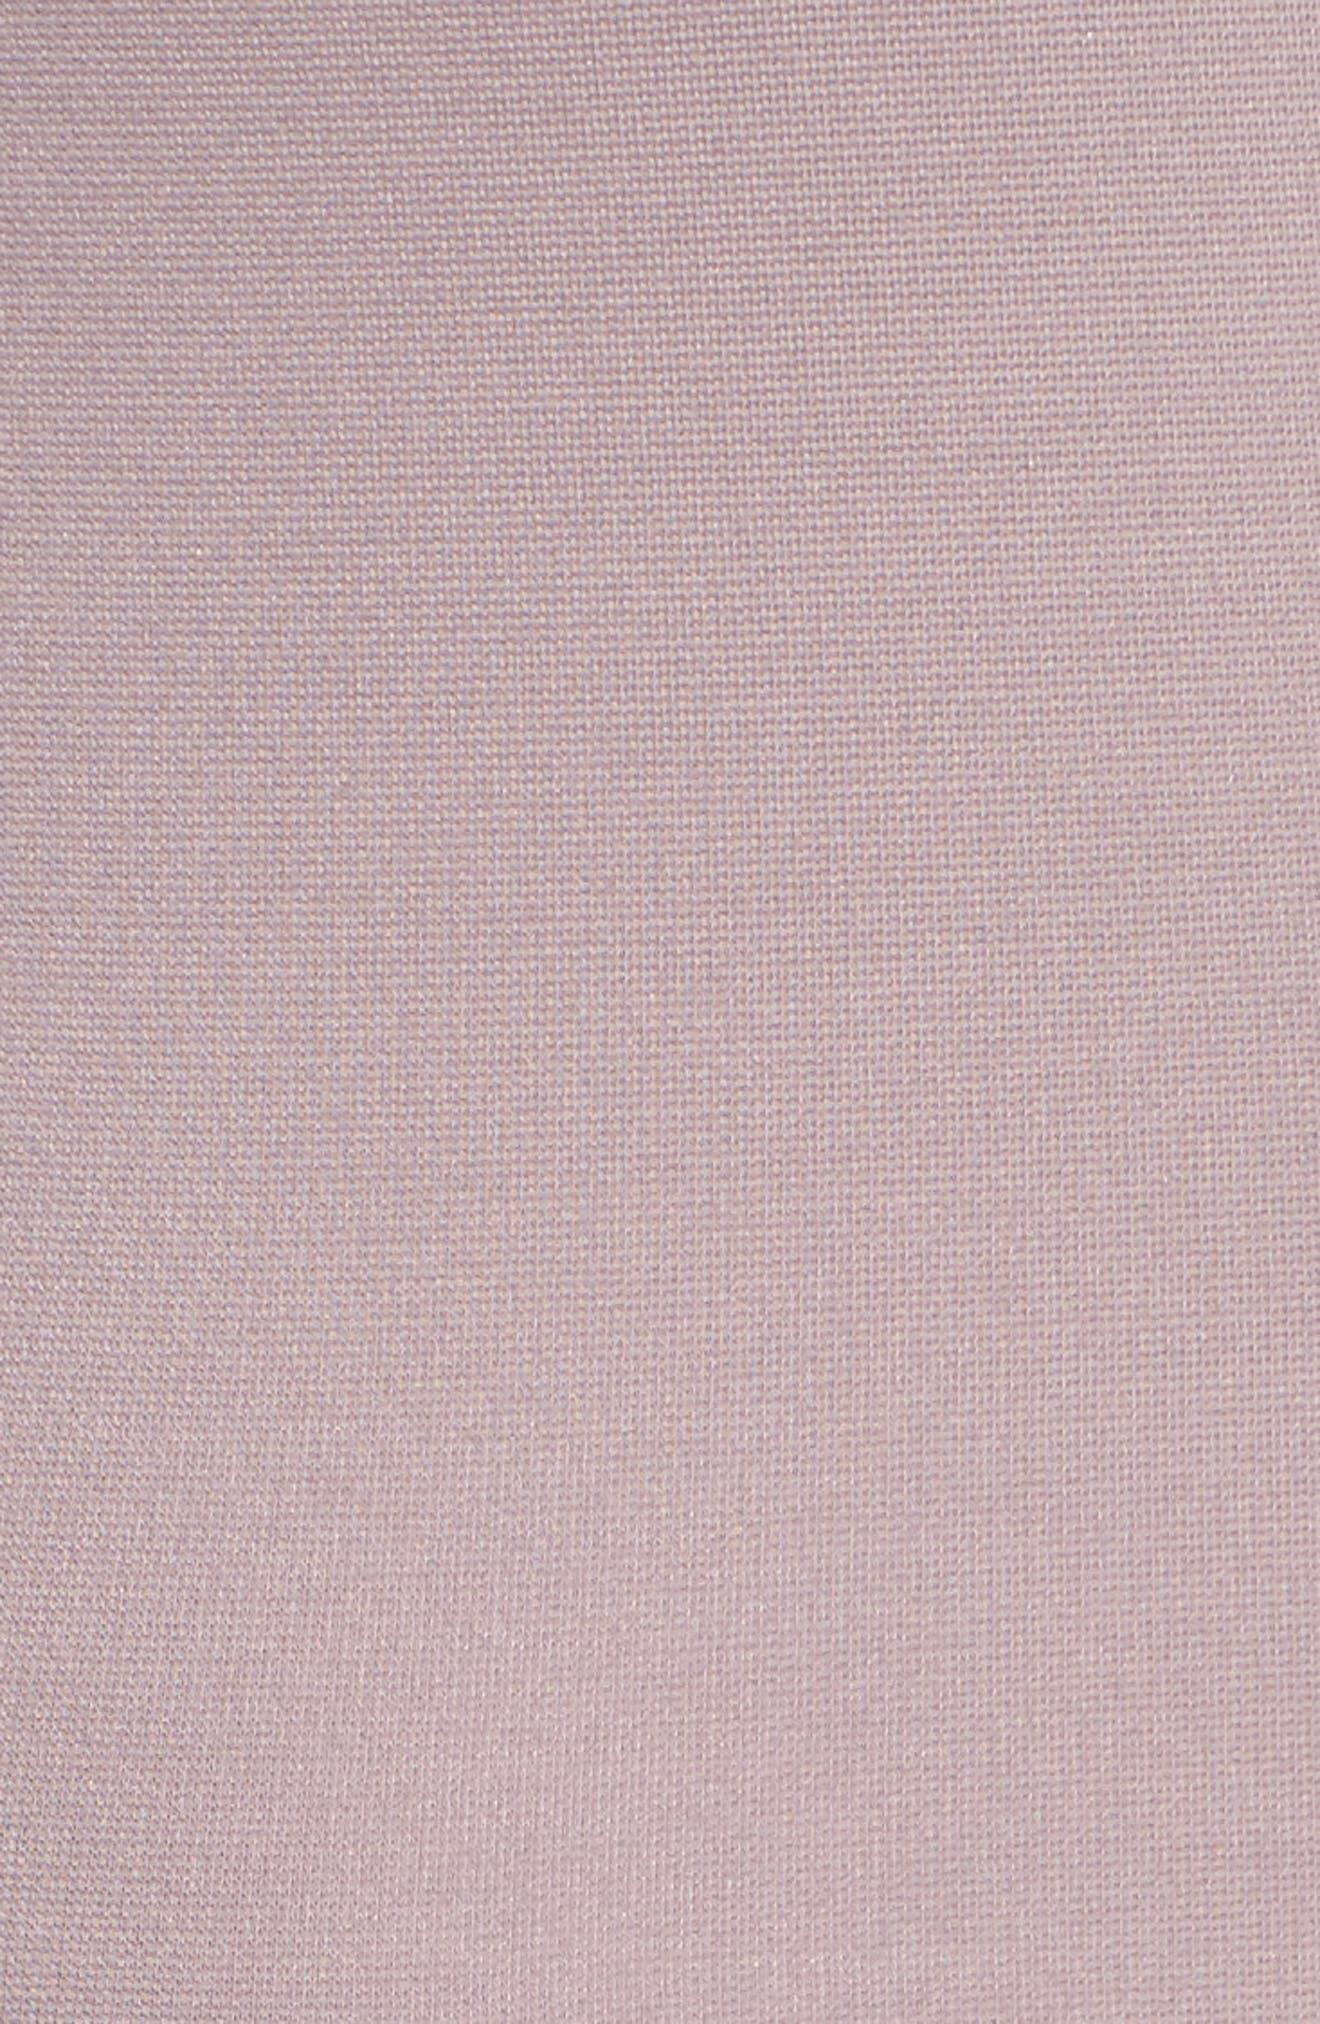 Stretch Knit Midi Dress,                             Alternate thumbnail 51, color,